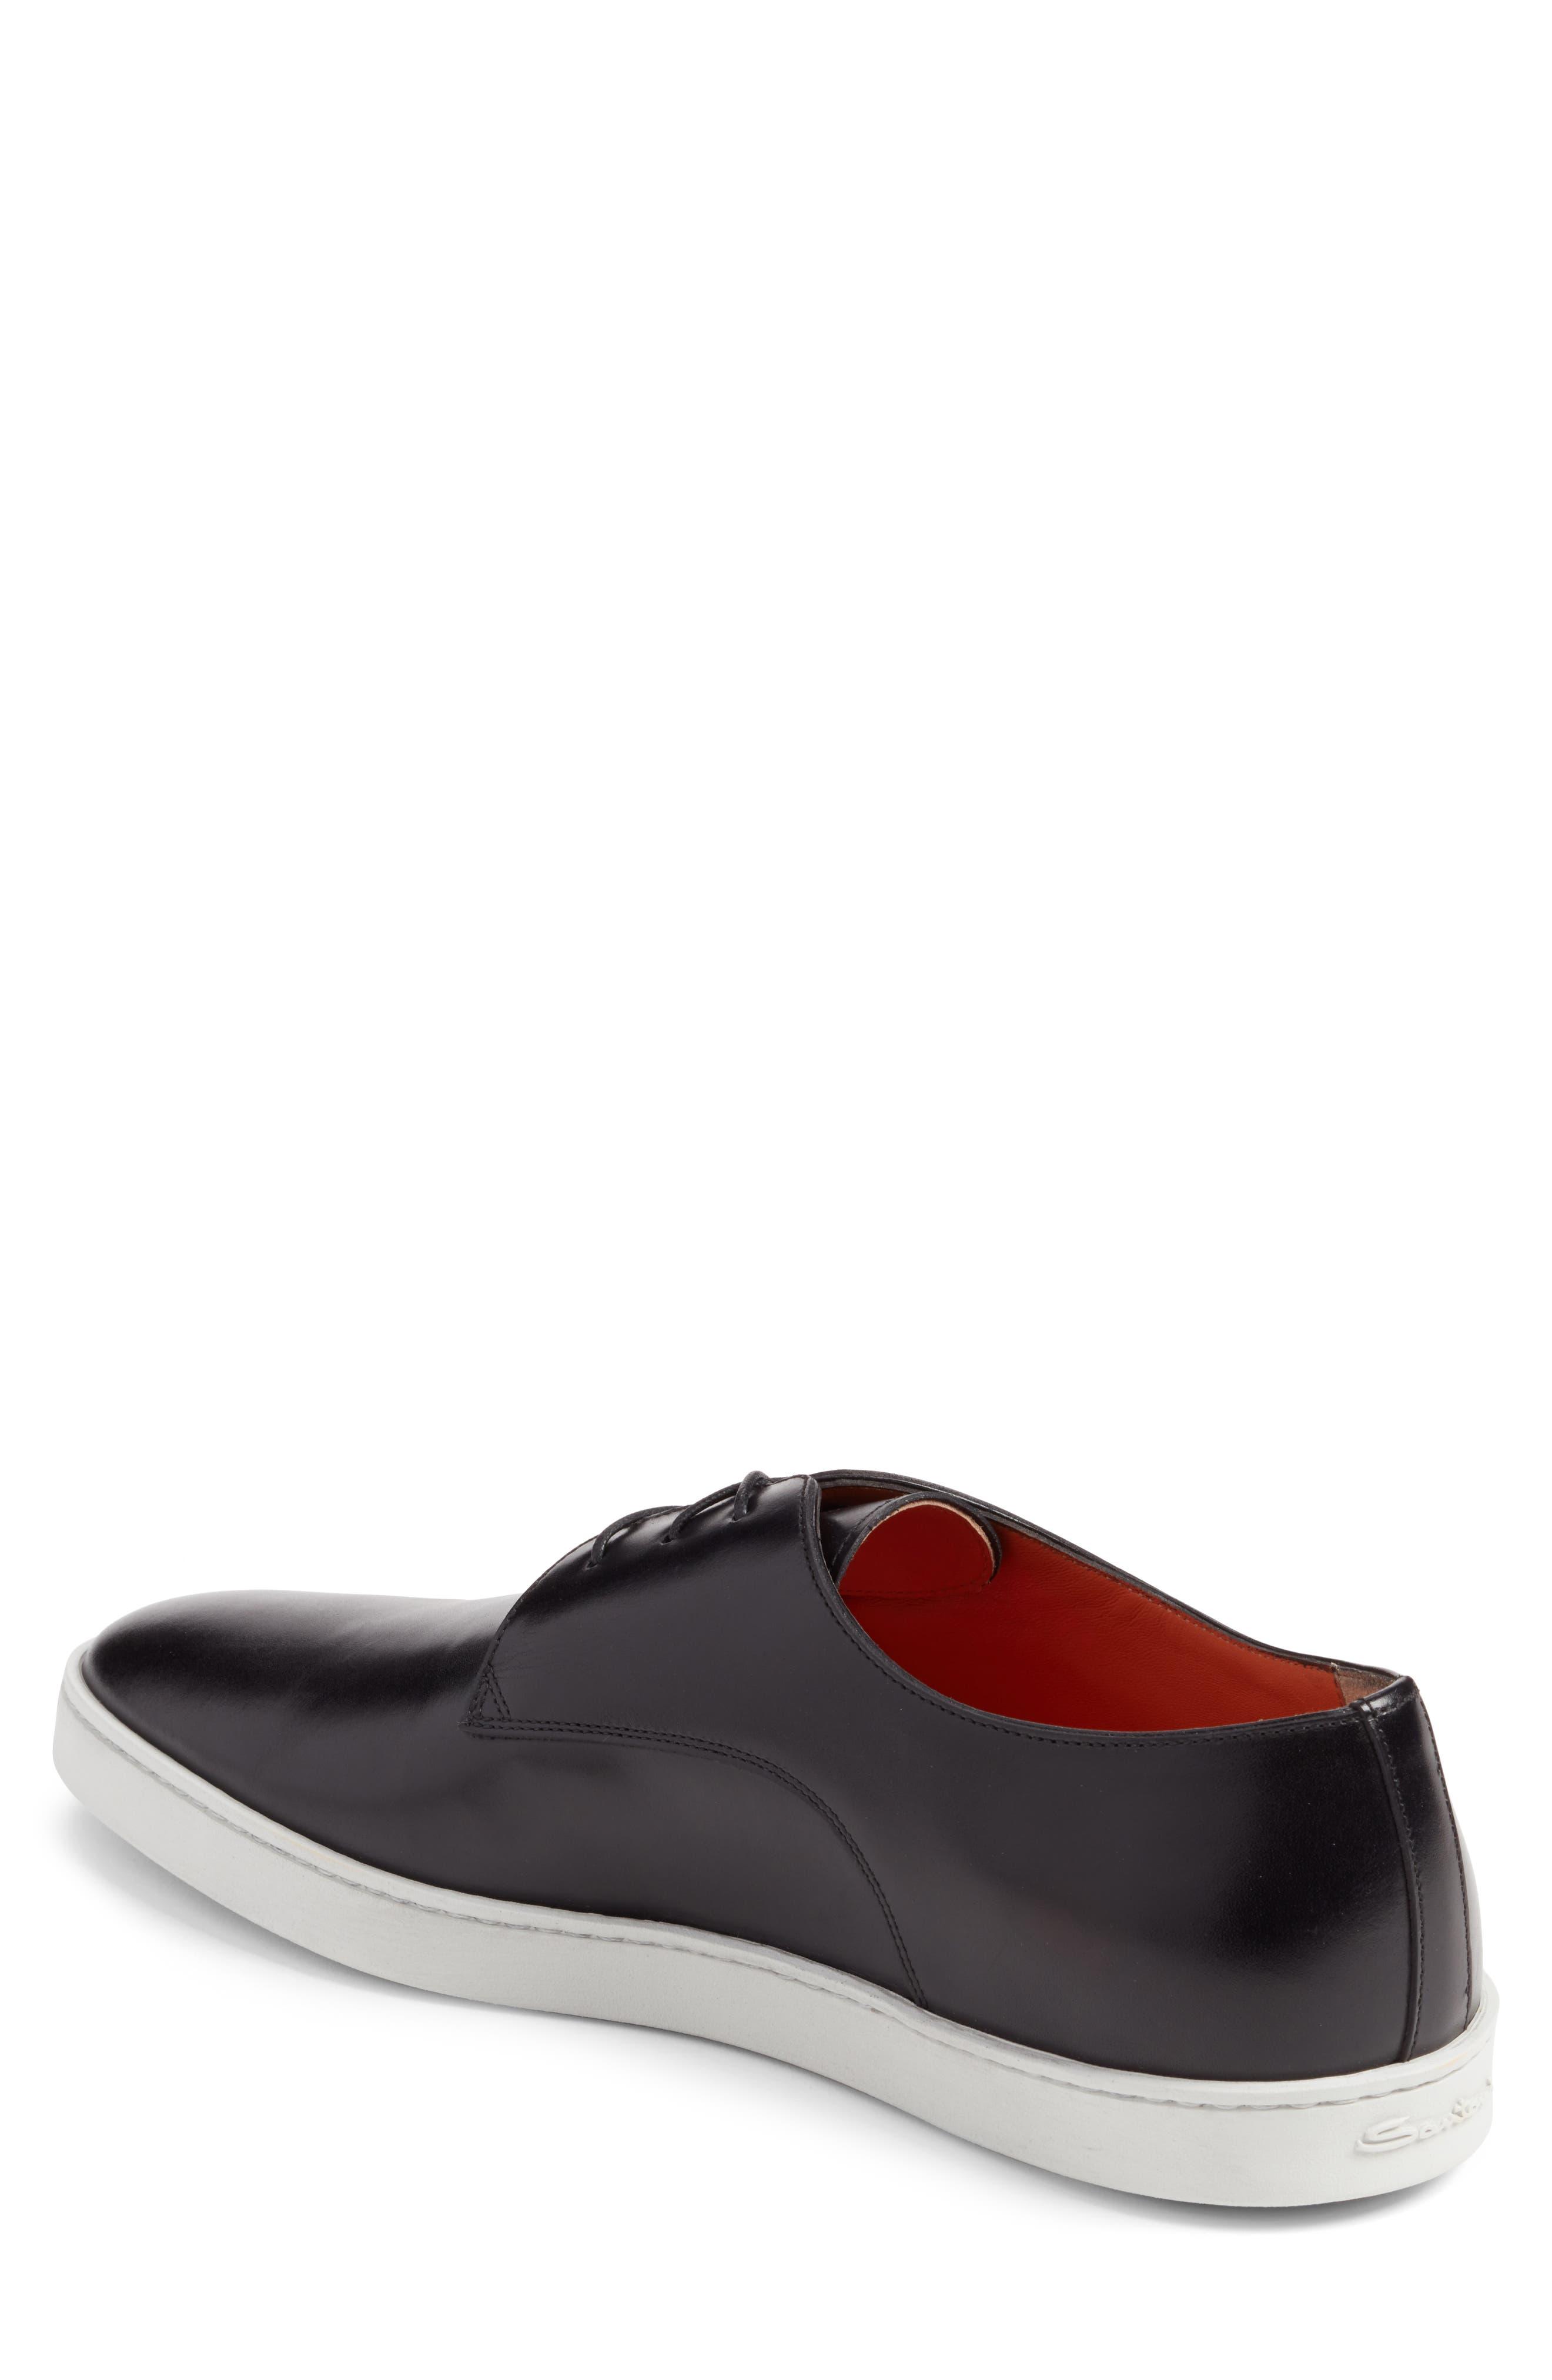 SANTONI, Doyle Sneaker, Alternate thumbnail 2, color, BLACK LEATHER